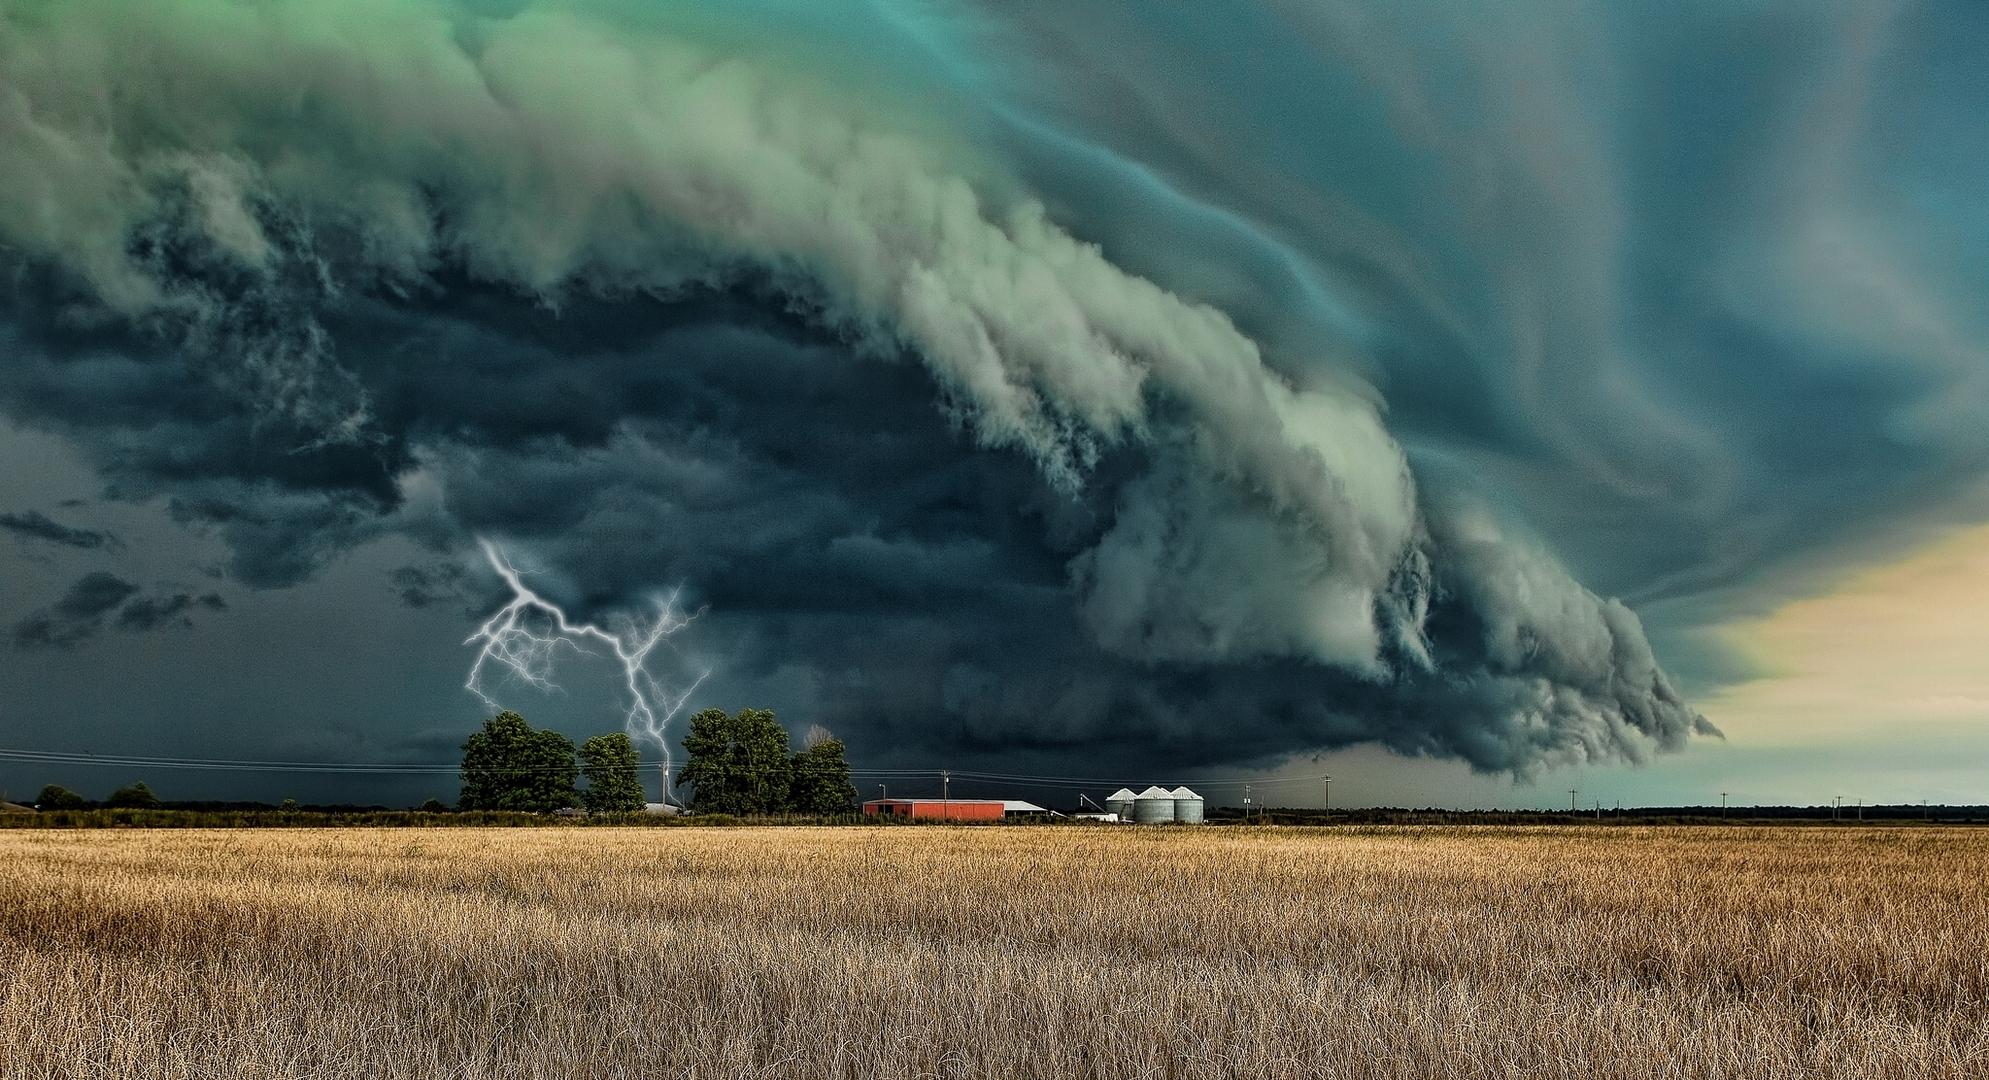 beautiful-storm-clouds-wallpaper-4.jpg